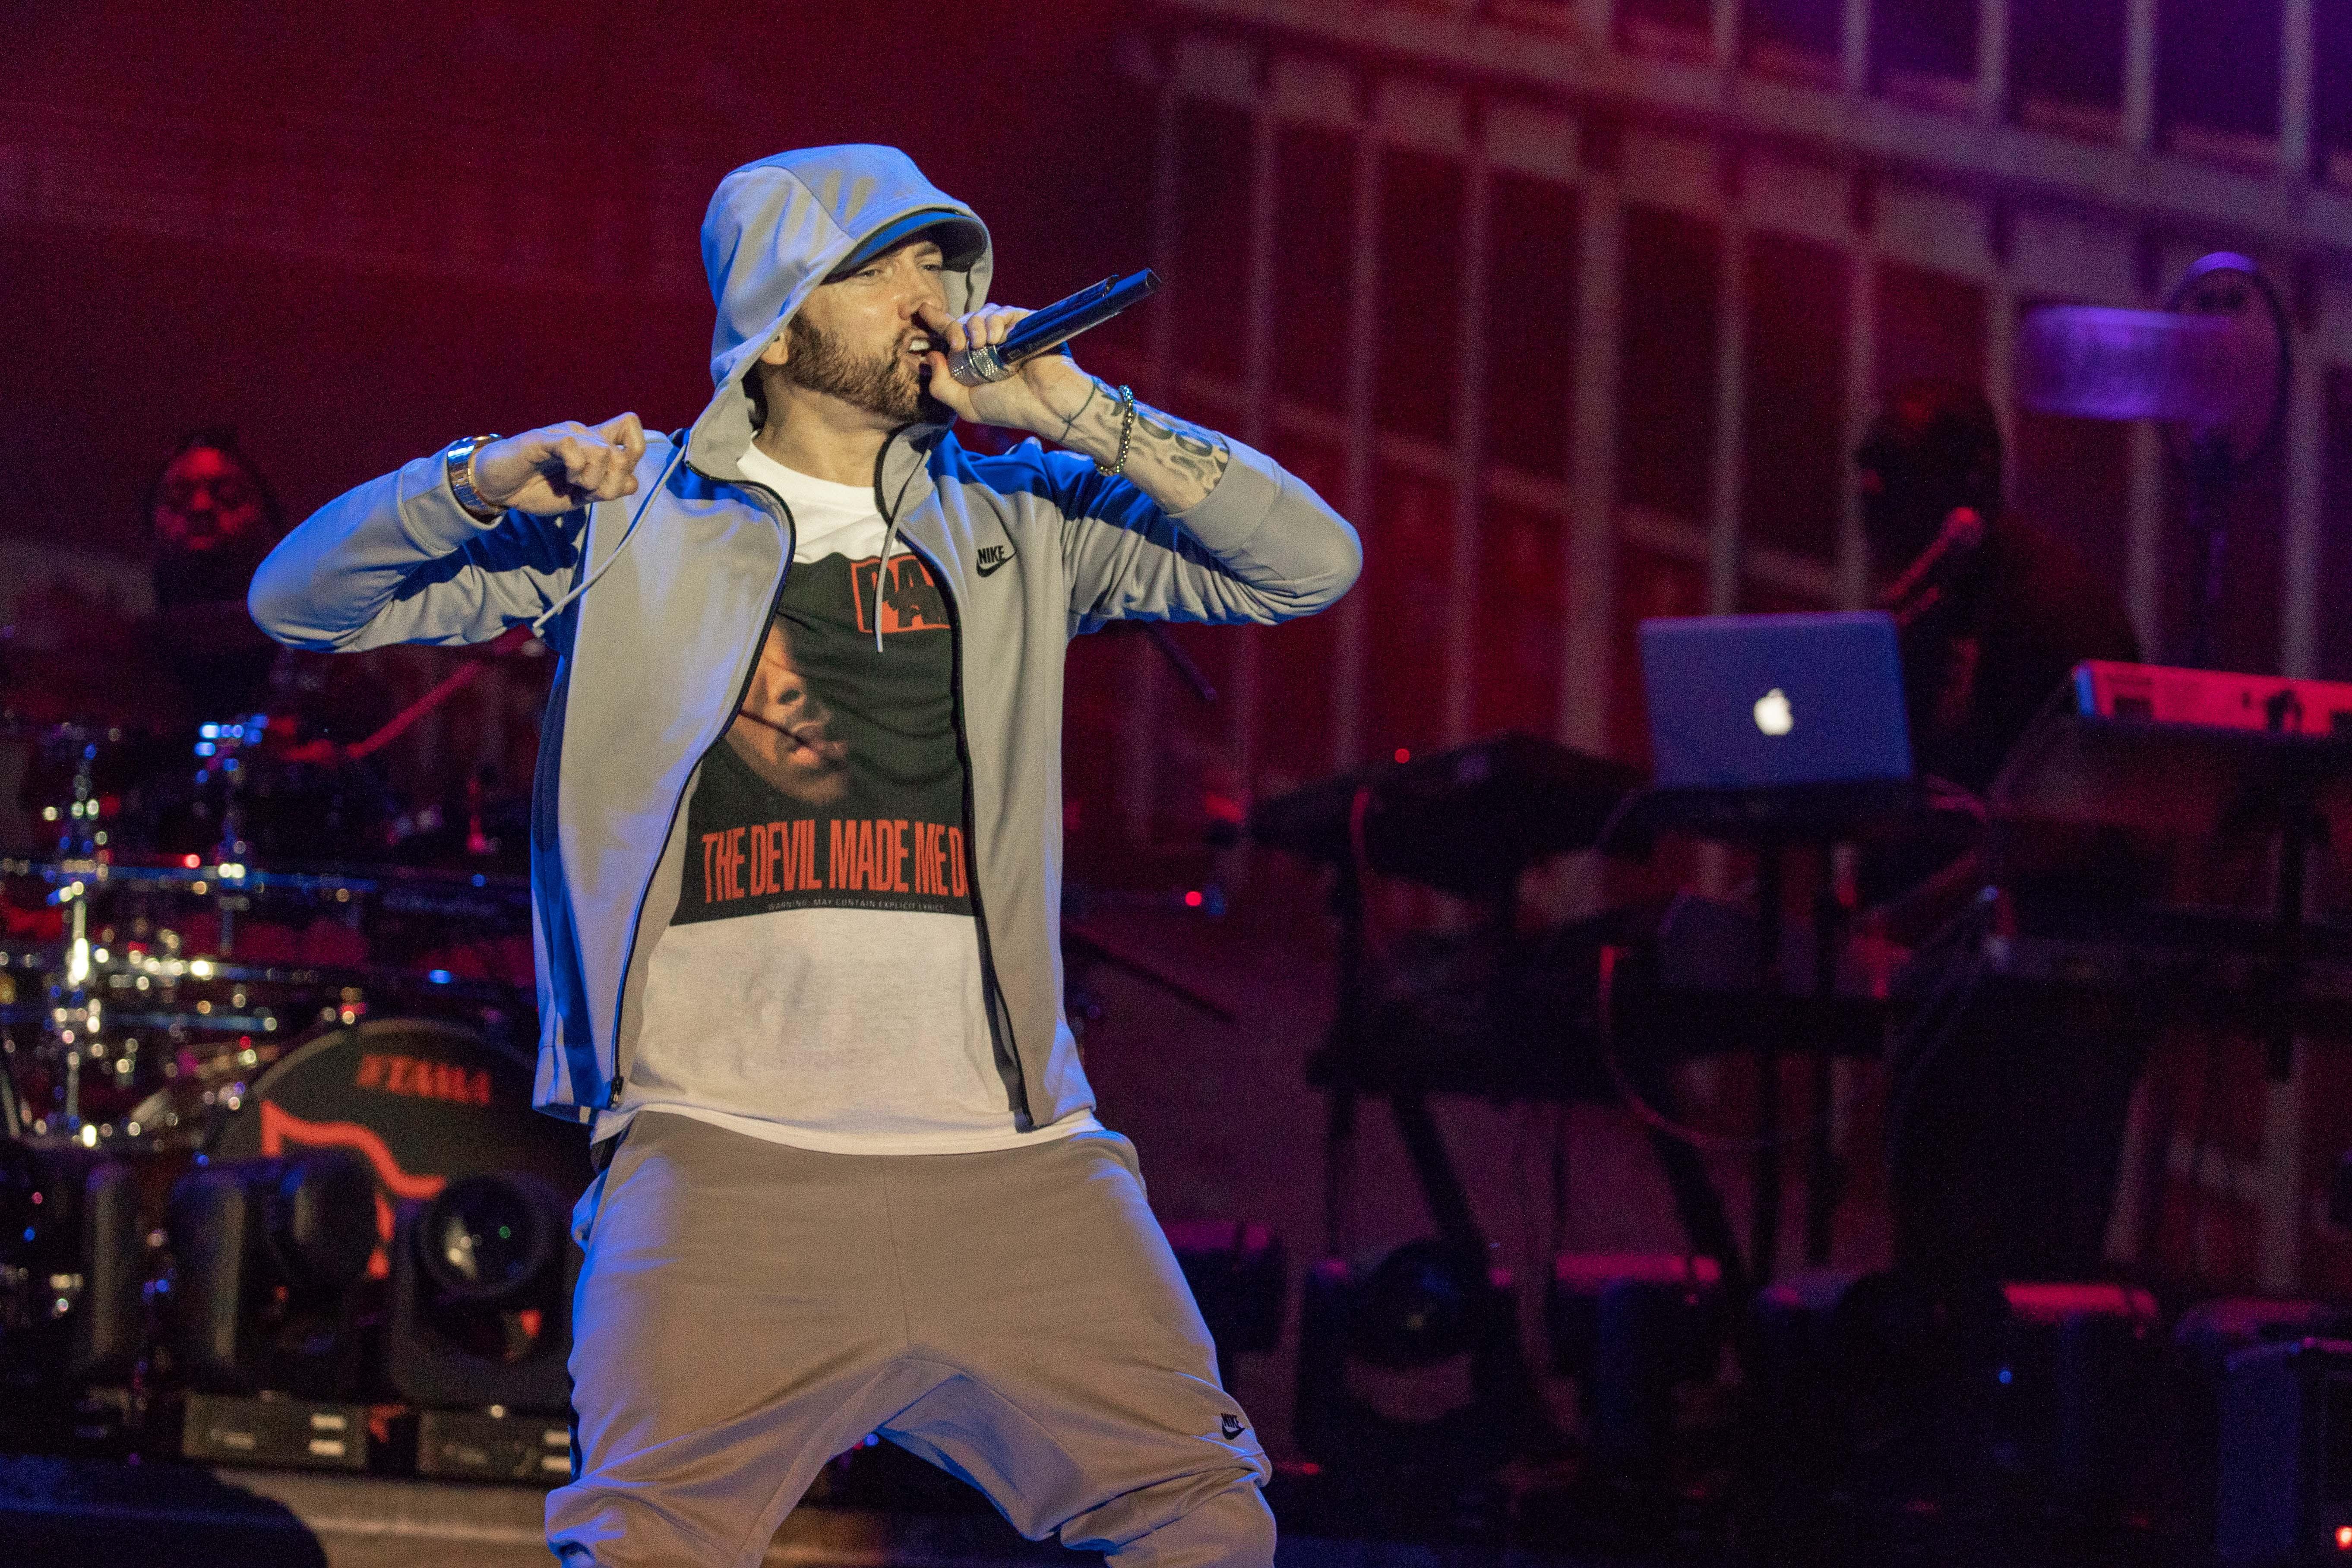 Eminem's 'Kamikaze' Debuts at Number One, Fourth Best Sales of 2018